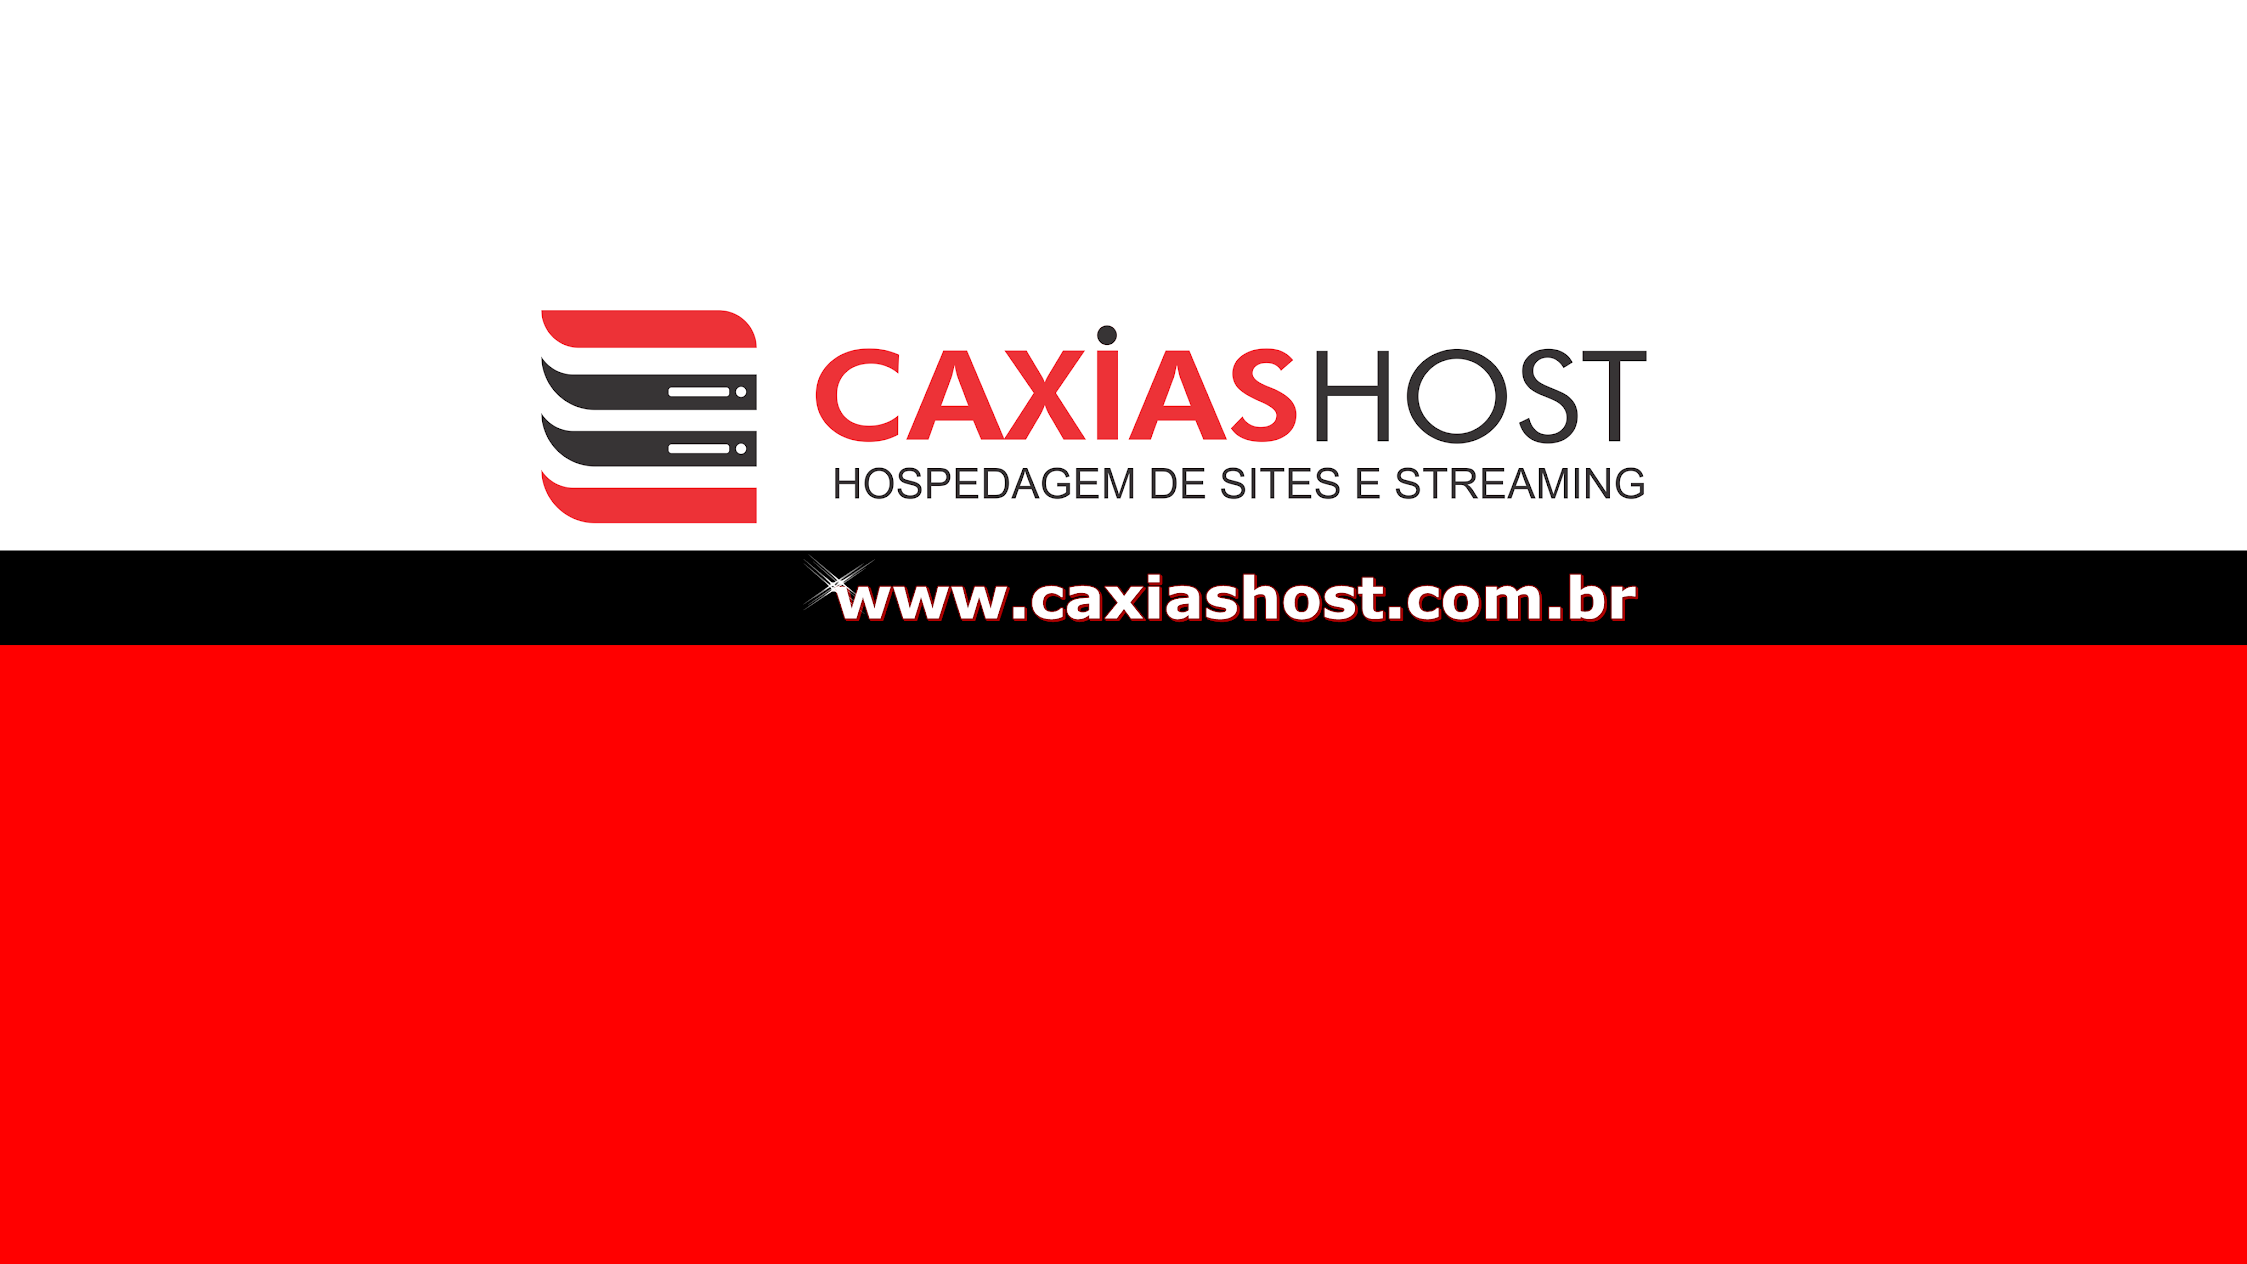 Caxias Host Internet